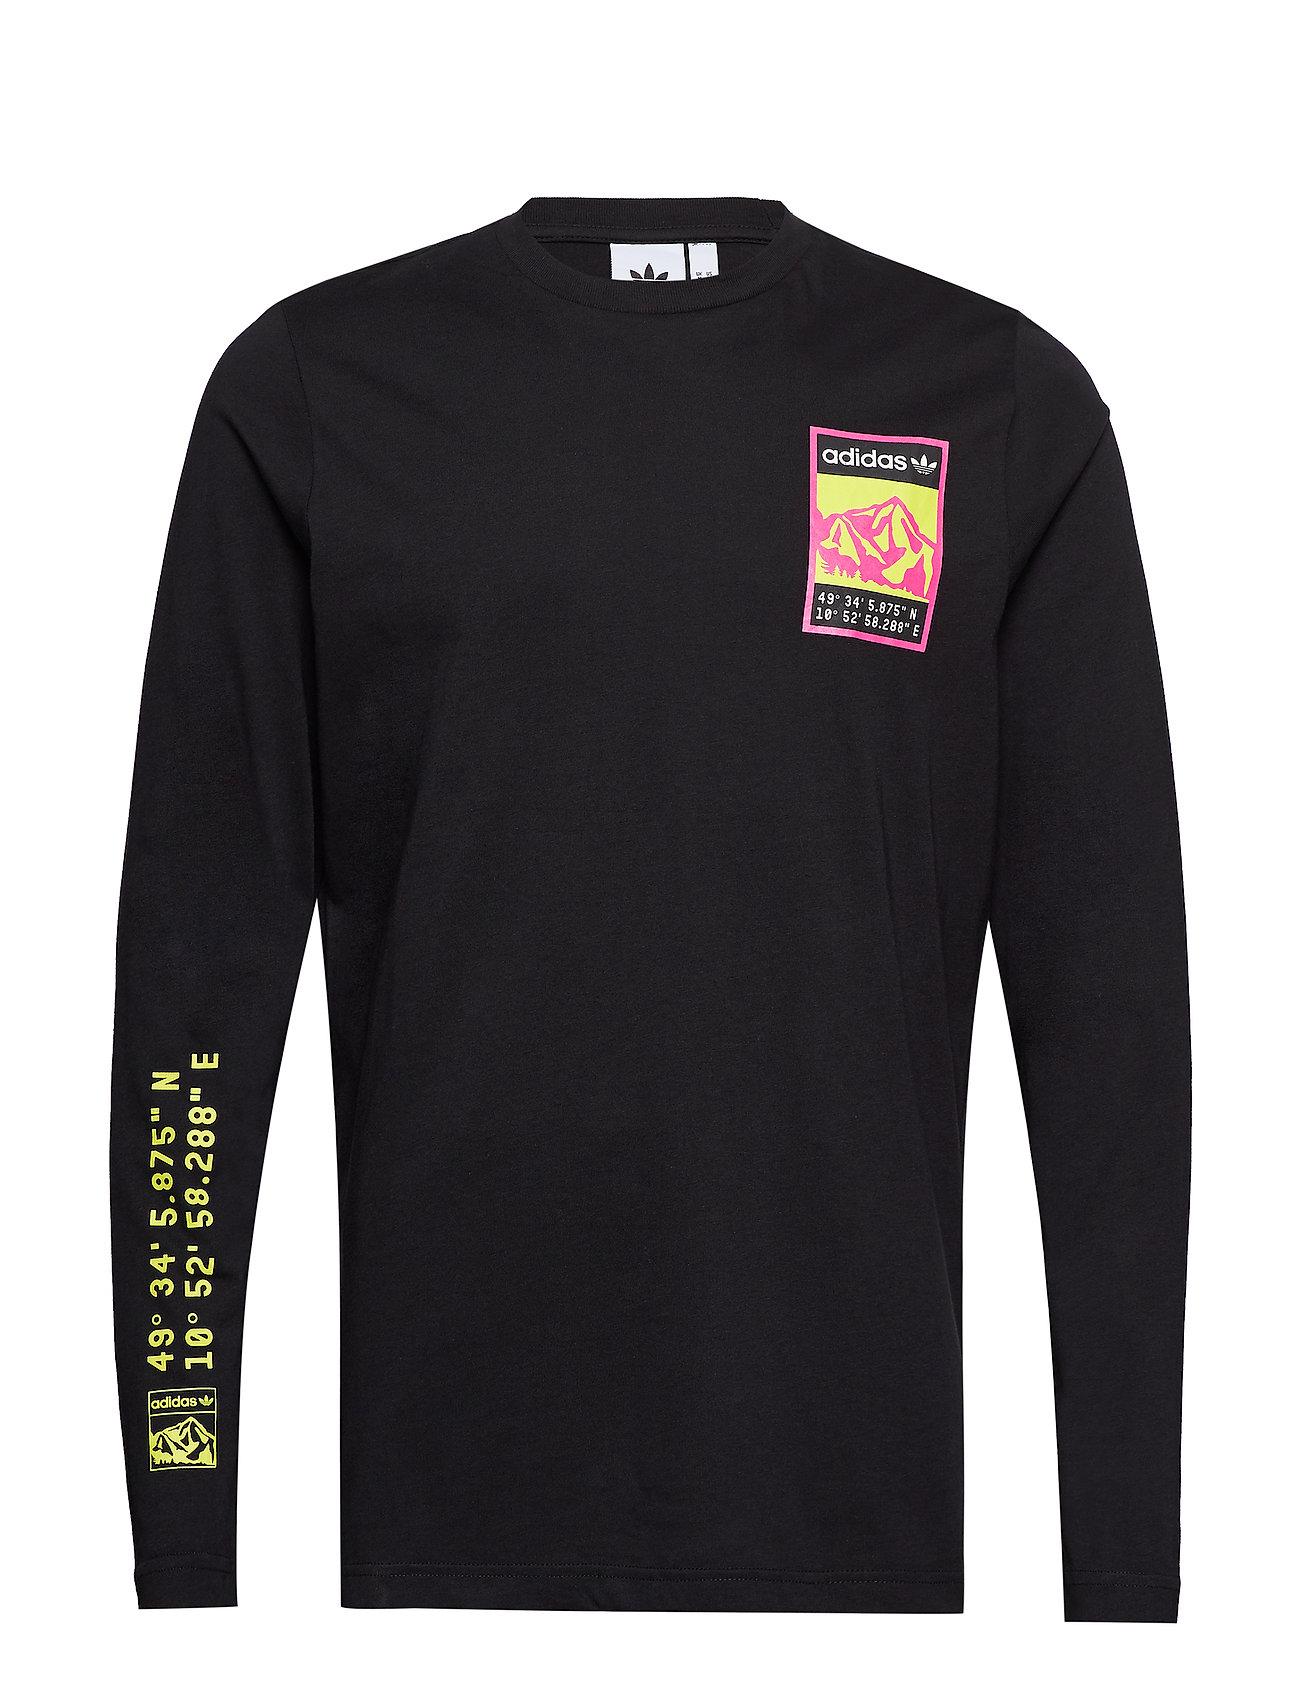 adidas Originals LONGSLEEVE - BLACK